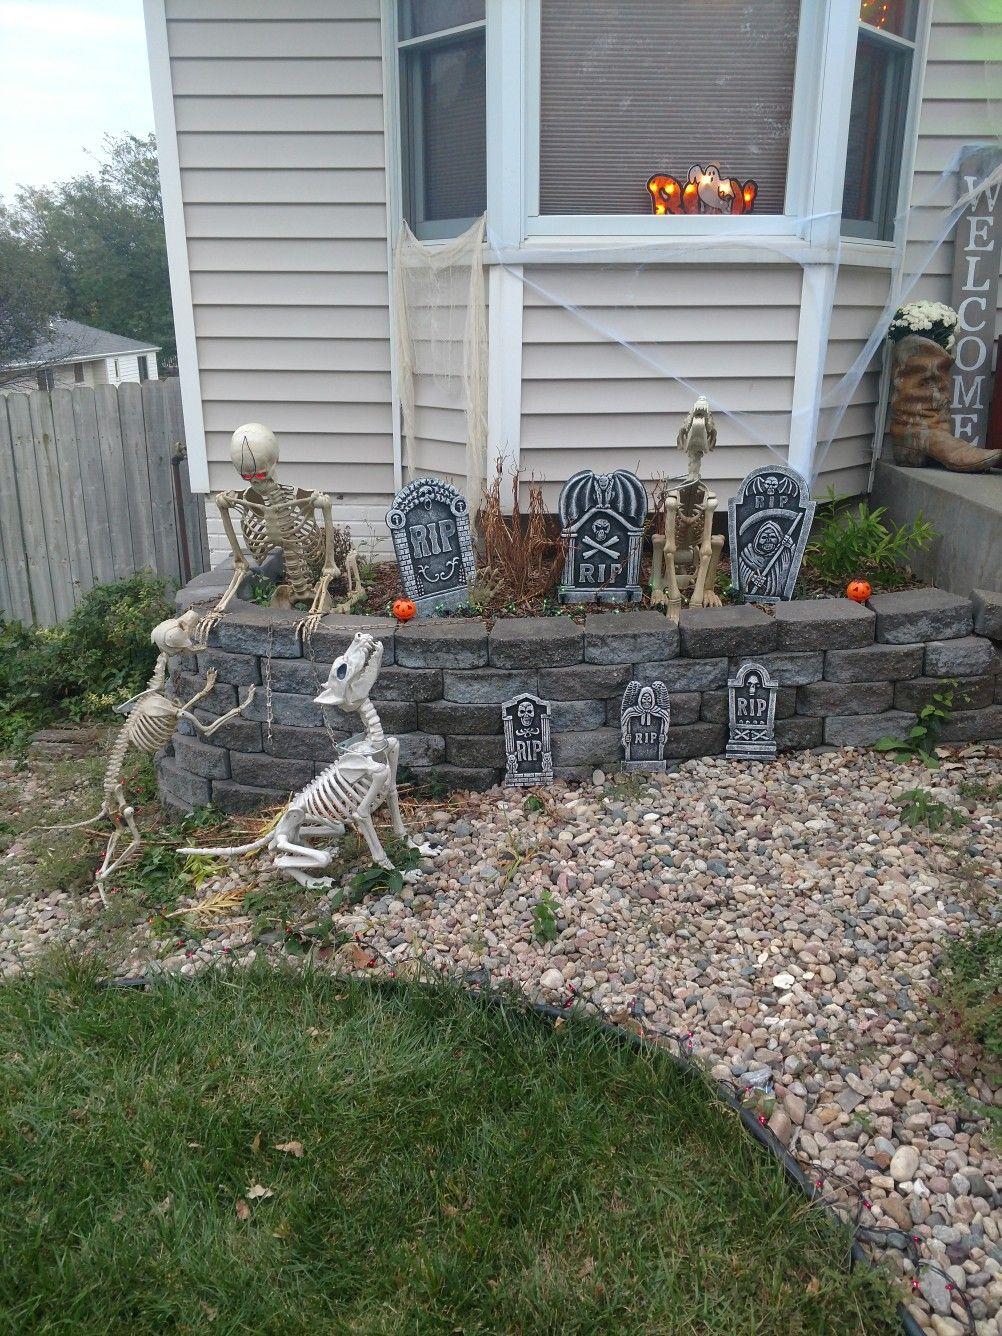 Halloween Yards 2020 Grave Pet Pet cemetery. Skeleton. Dog skeleton. Halloween decorations